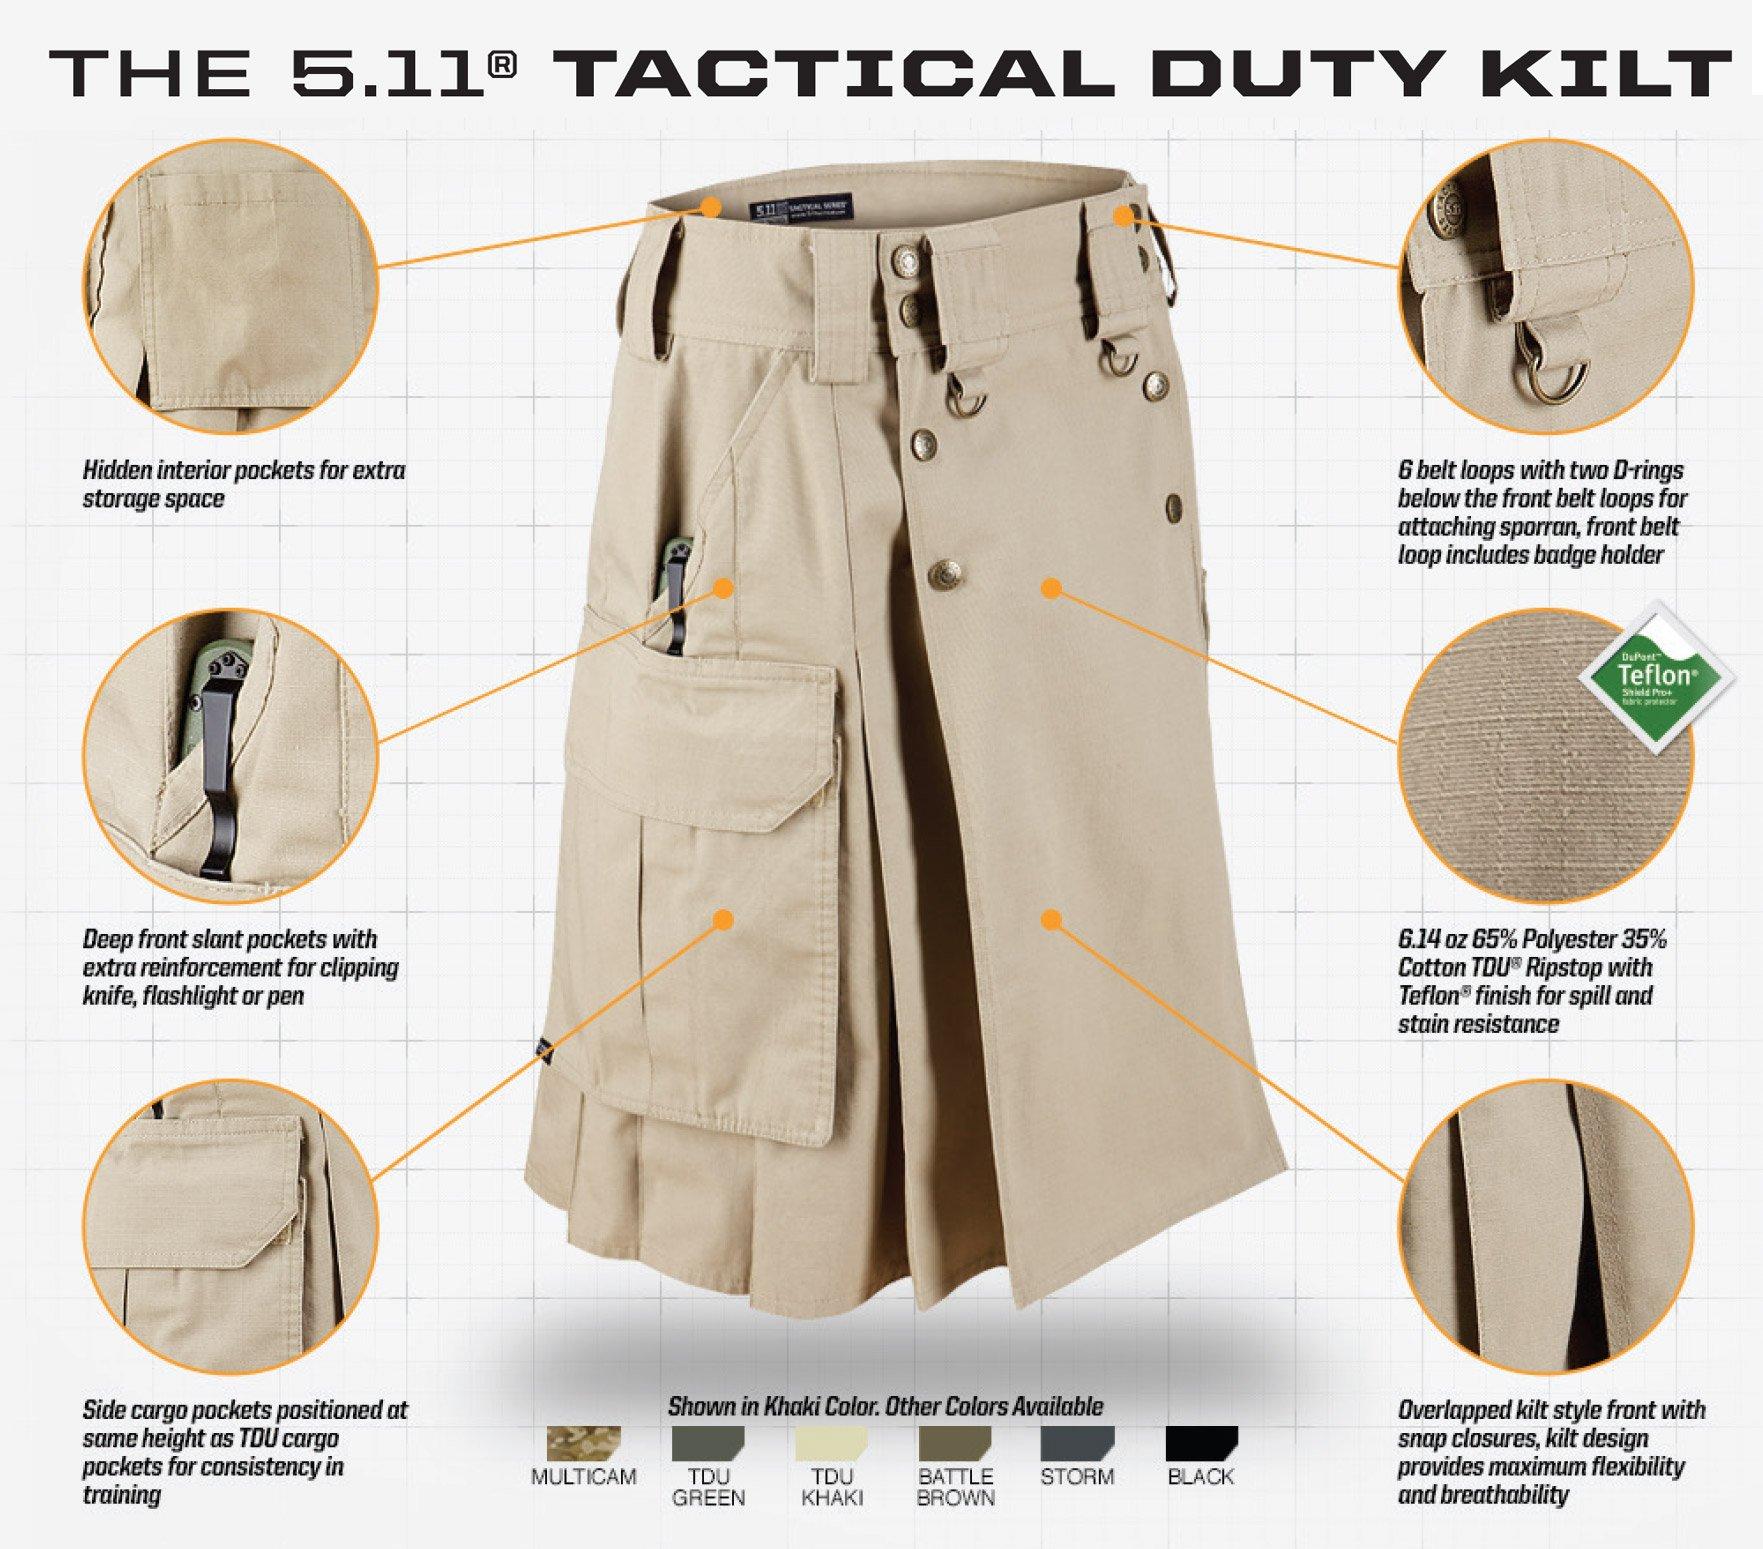 5-11 Tactical Duty Kilt